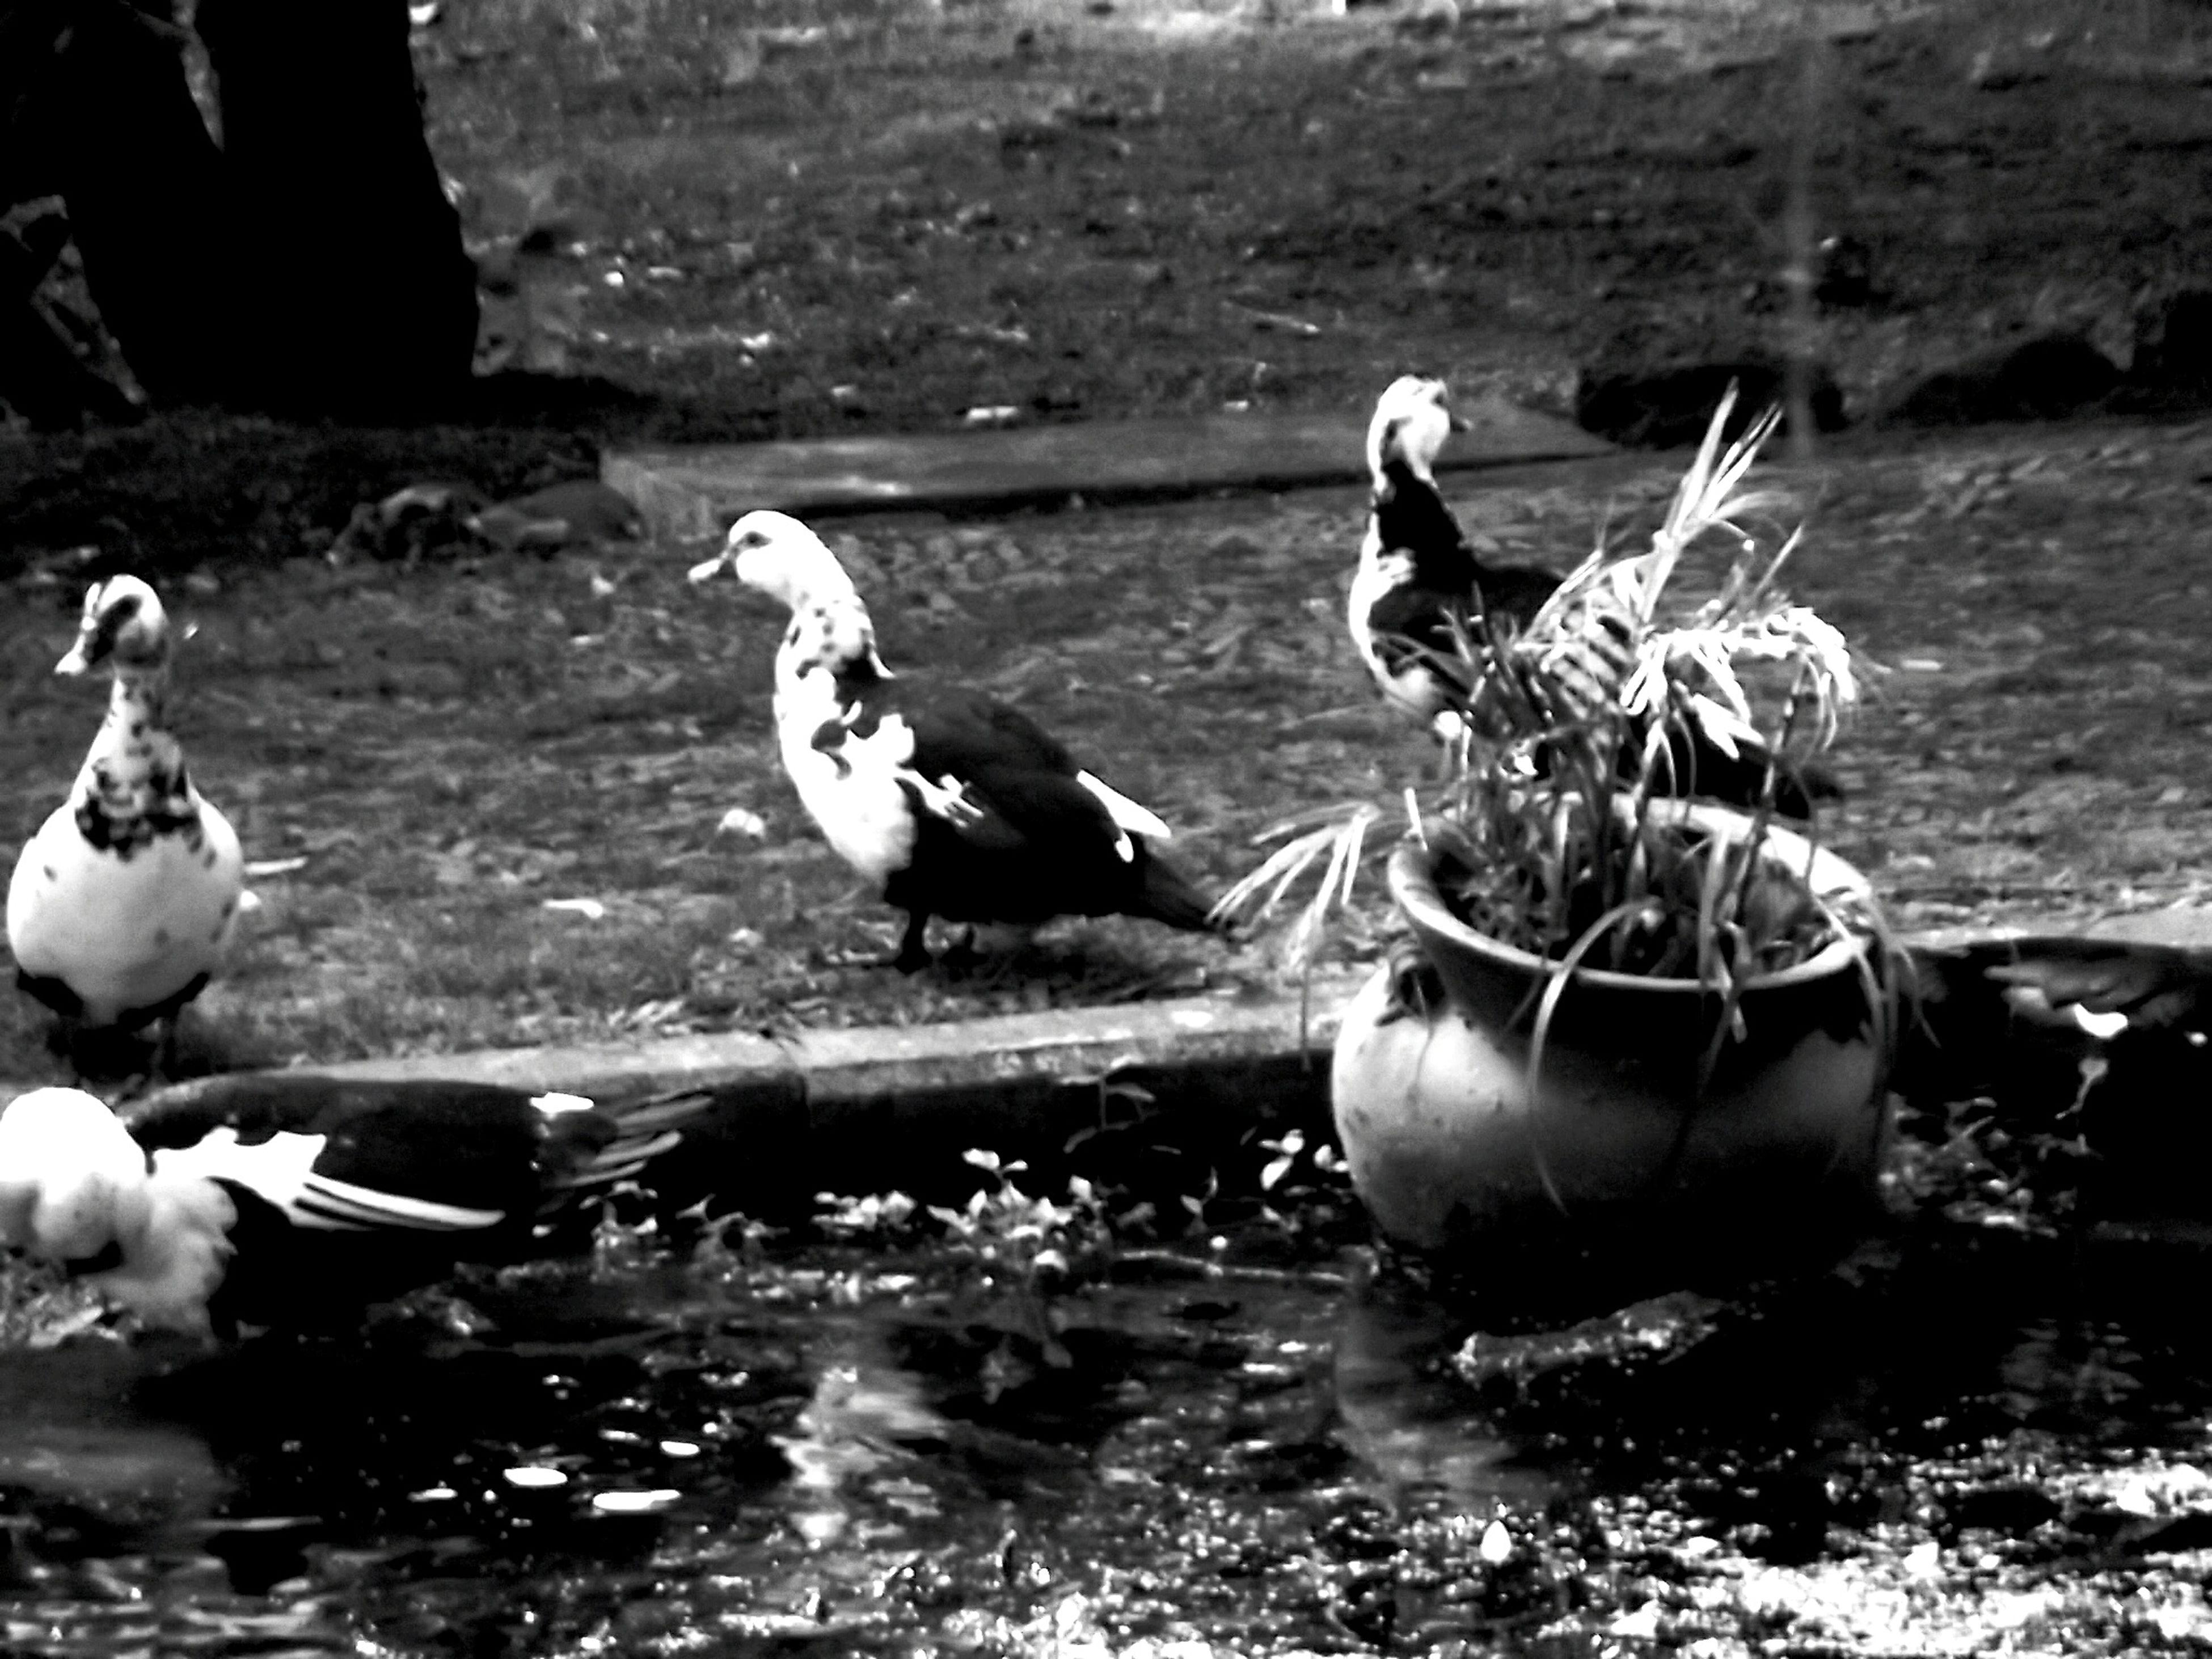 bird, water, animal themes, animals in the wild, wildlife, swimming, waterfront, lake, two animals, nature, medium group of animals, reflection, duck, day, perching, three animals, outdoors, swan, sunlight